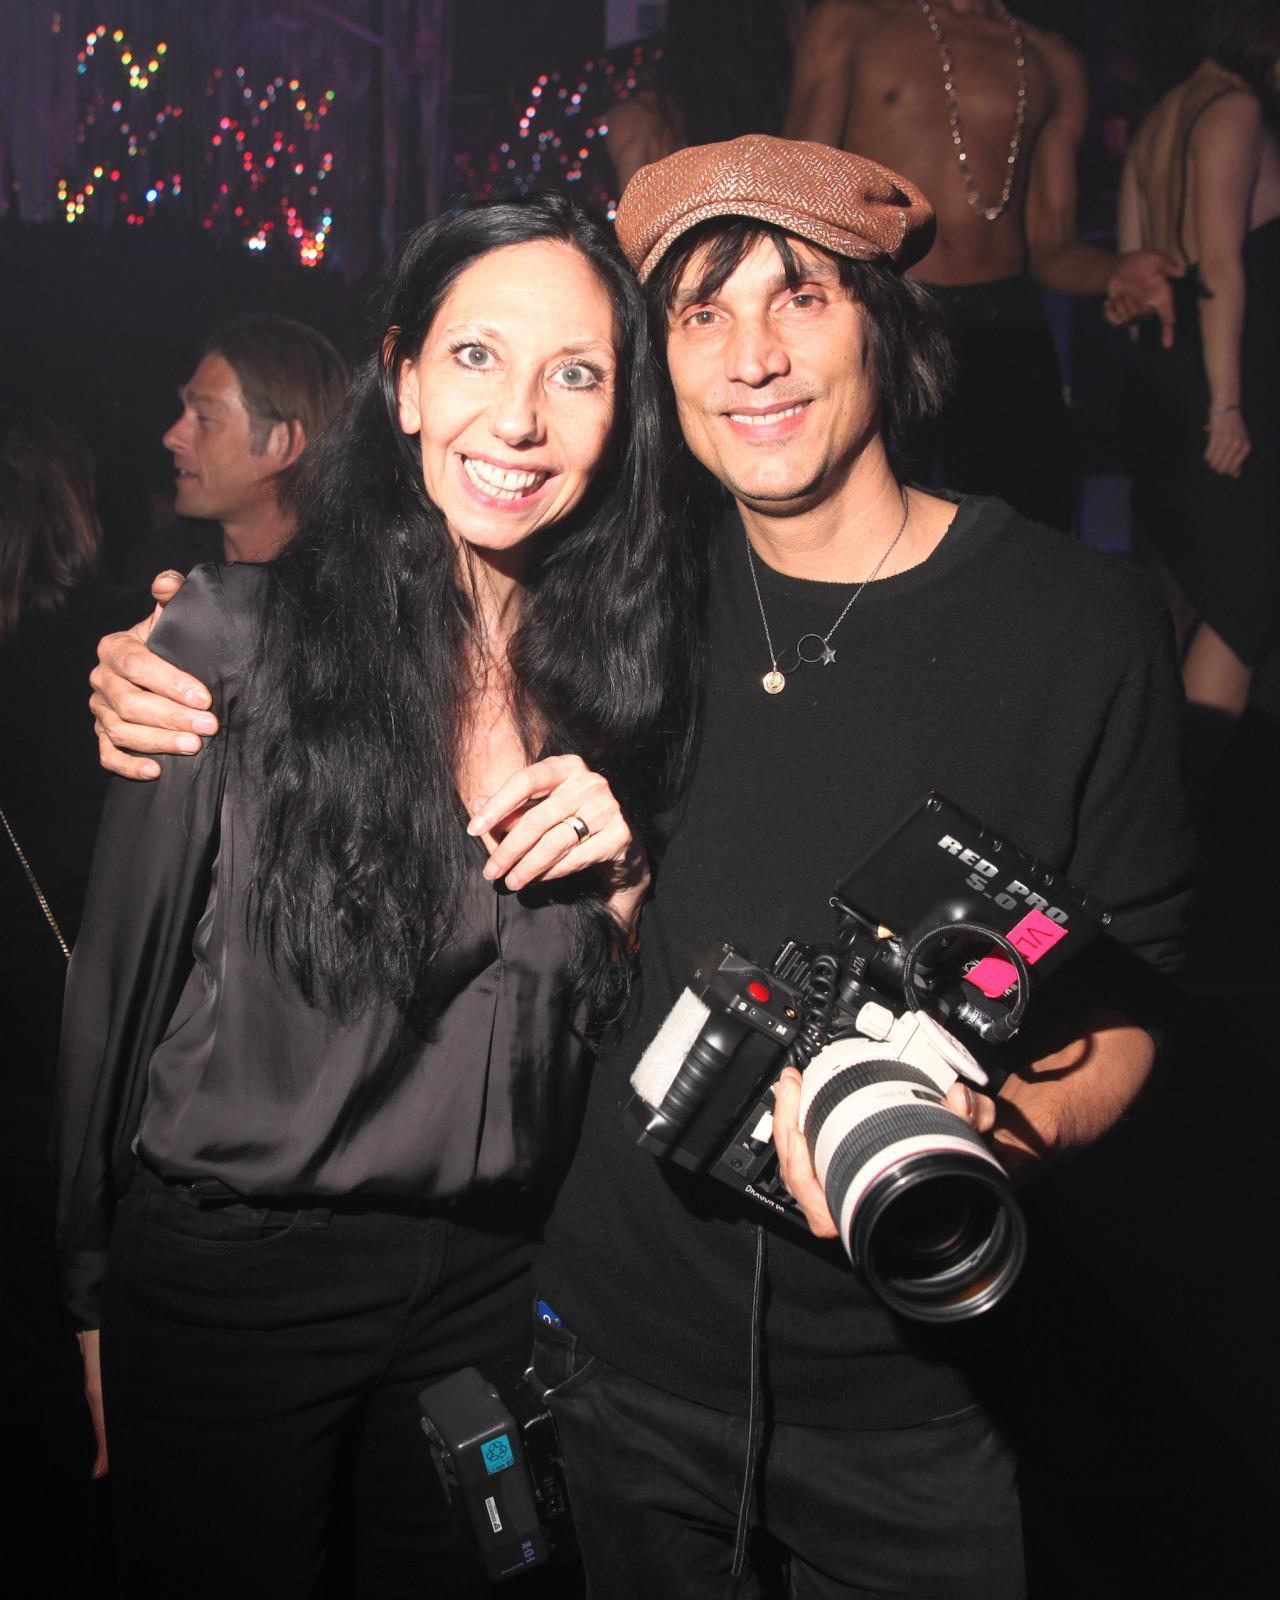 crfashionbook :      Inside Inez van Lamsweerde and Vinoodh Matadin's party with V Magazin e